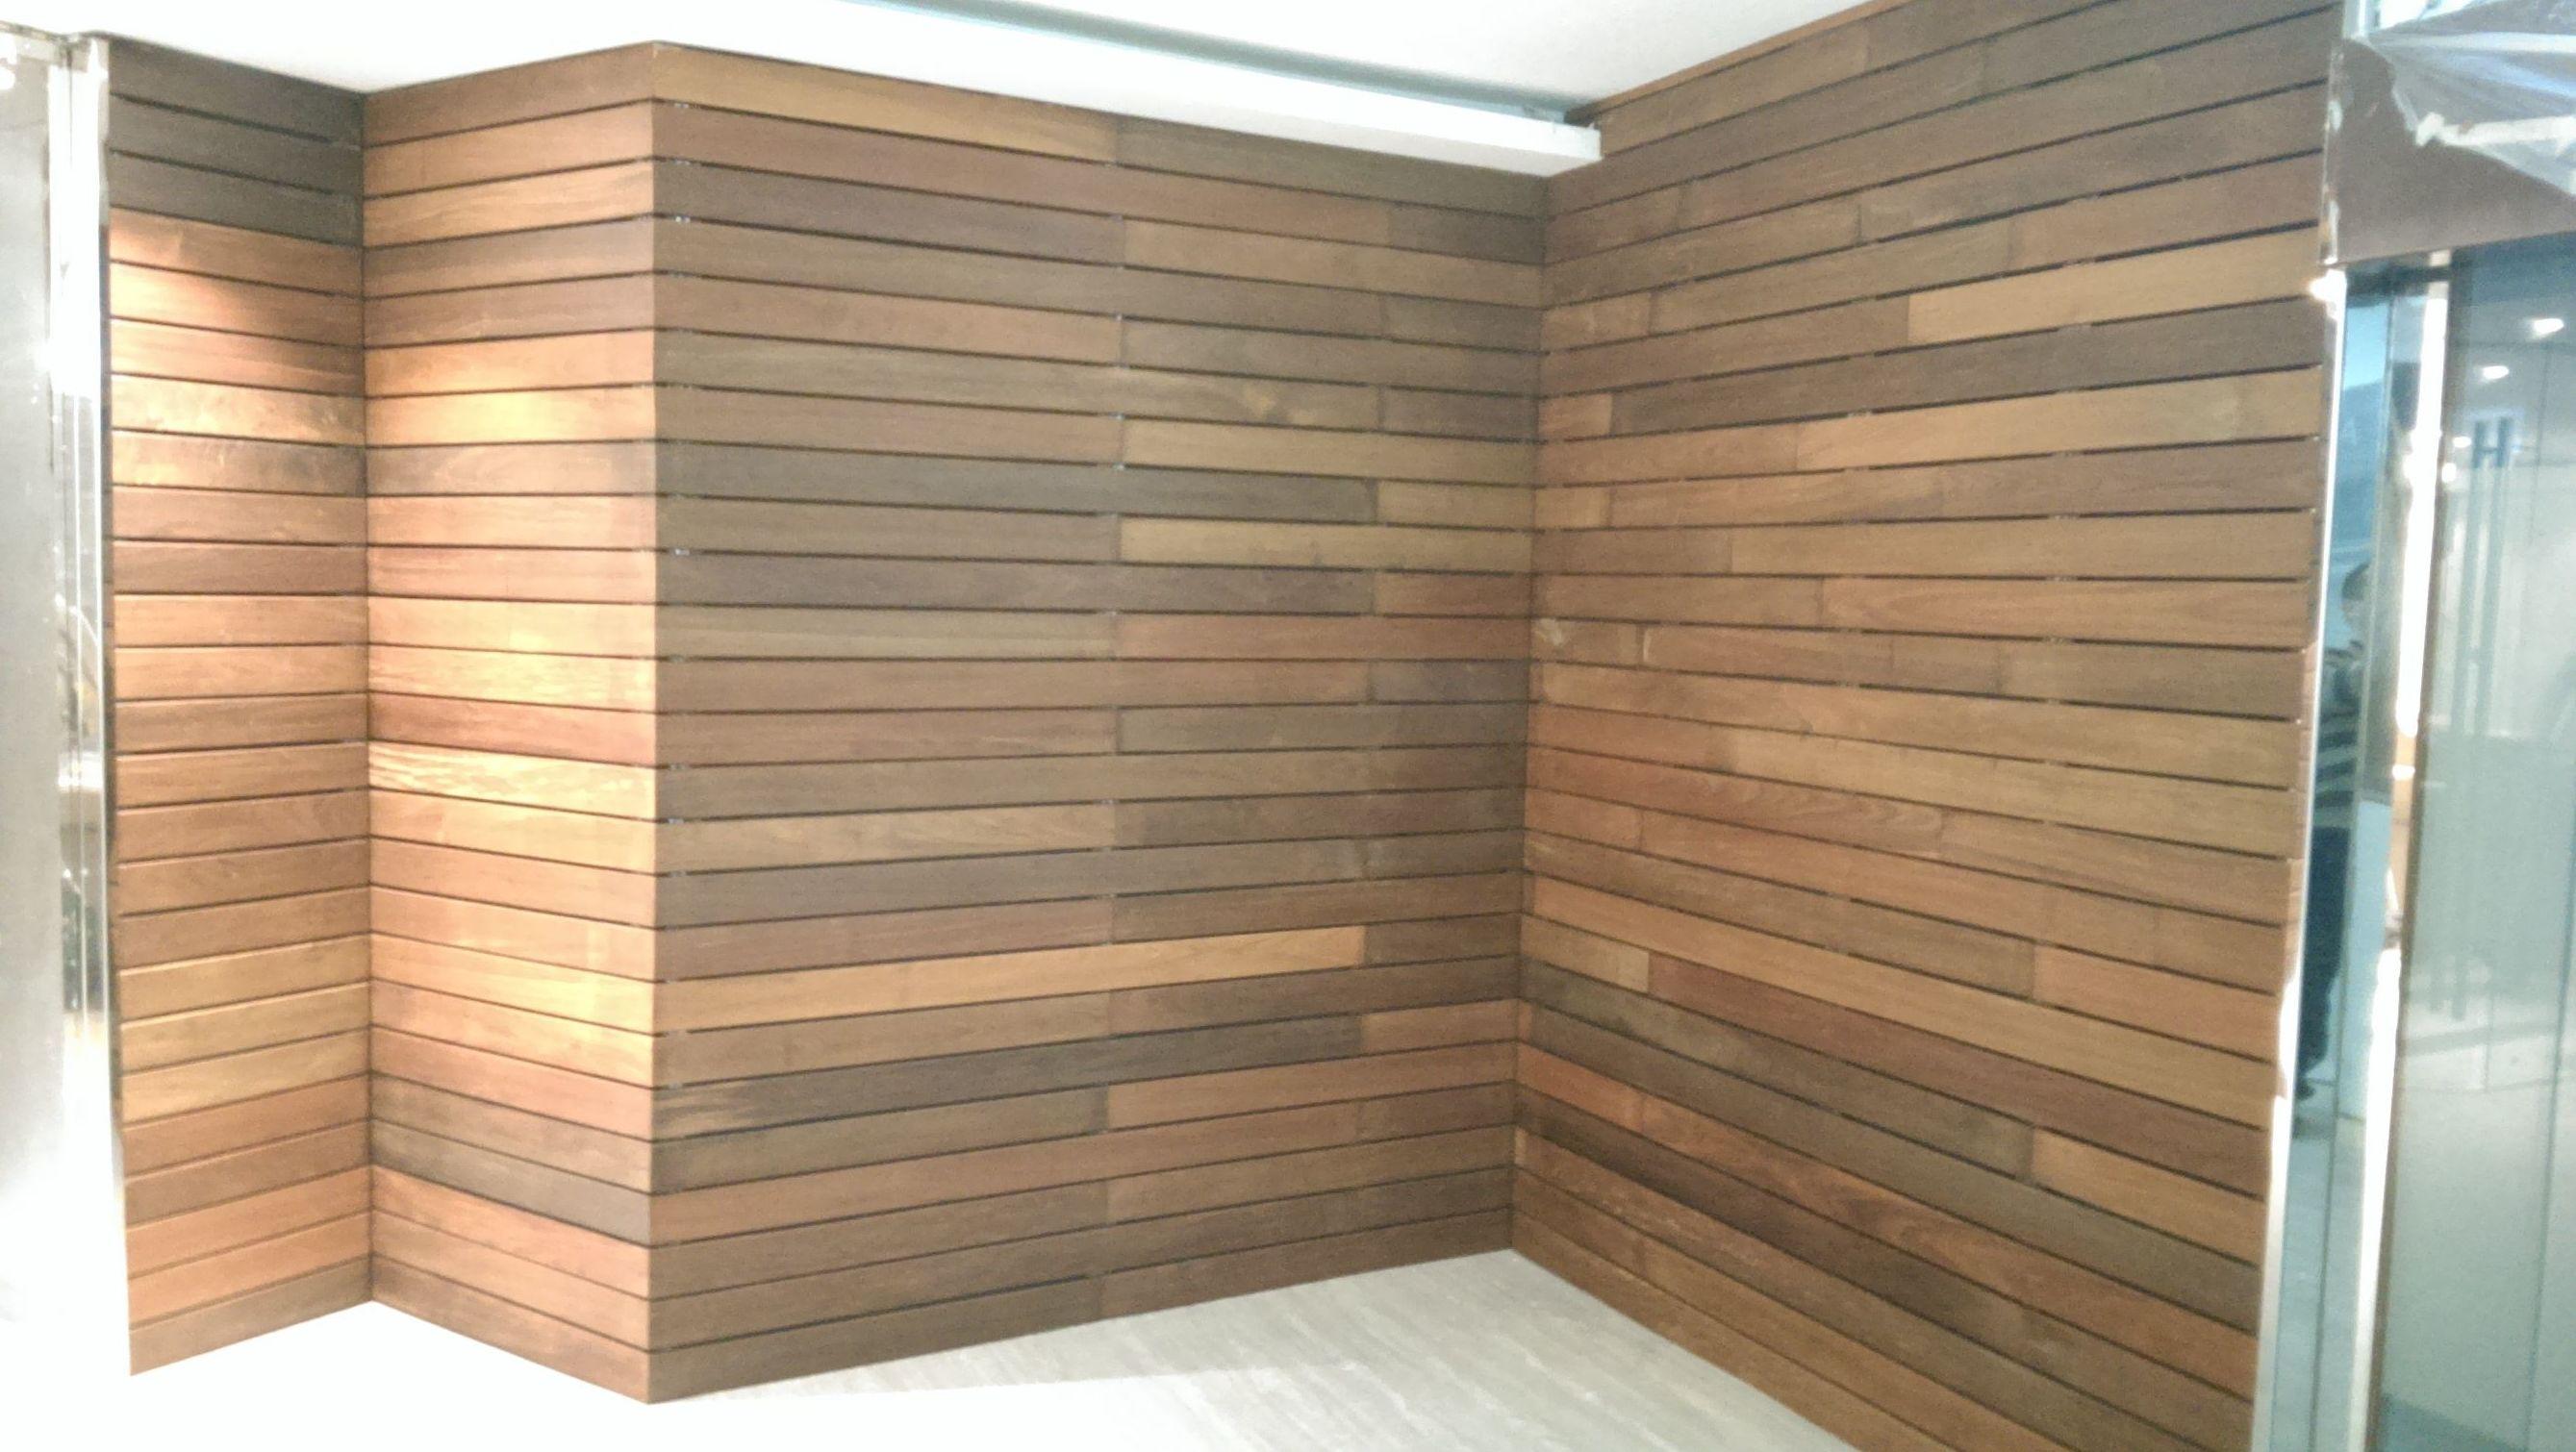 Tarimas de exterior en madera de ipe composite tecnologica - Tratamiento para madera de exterior ...